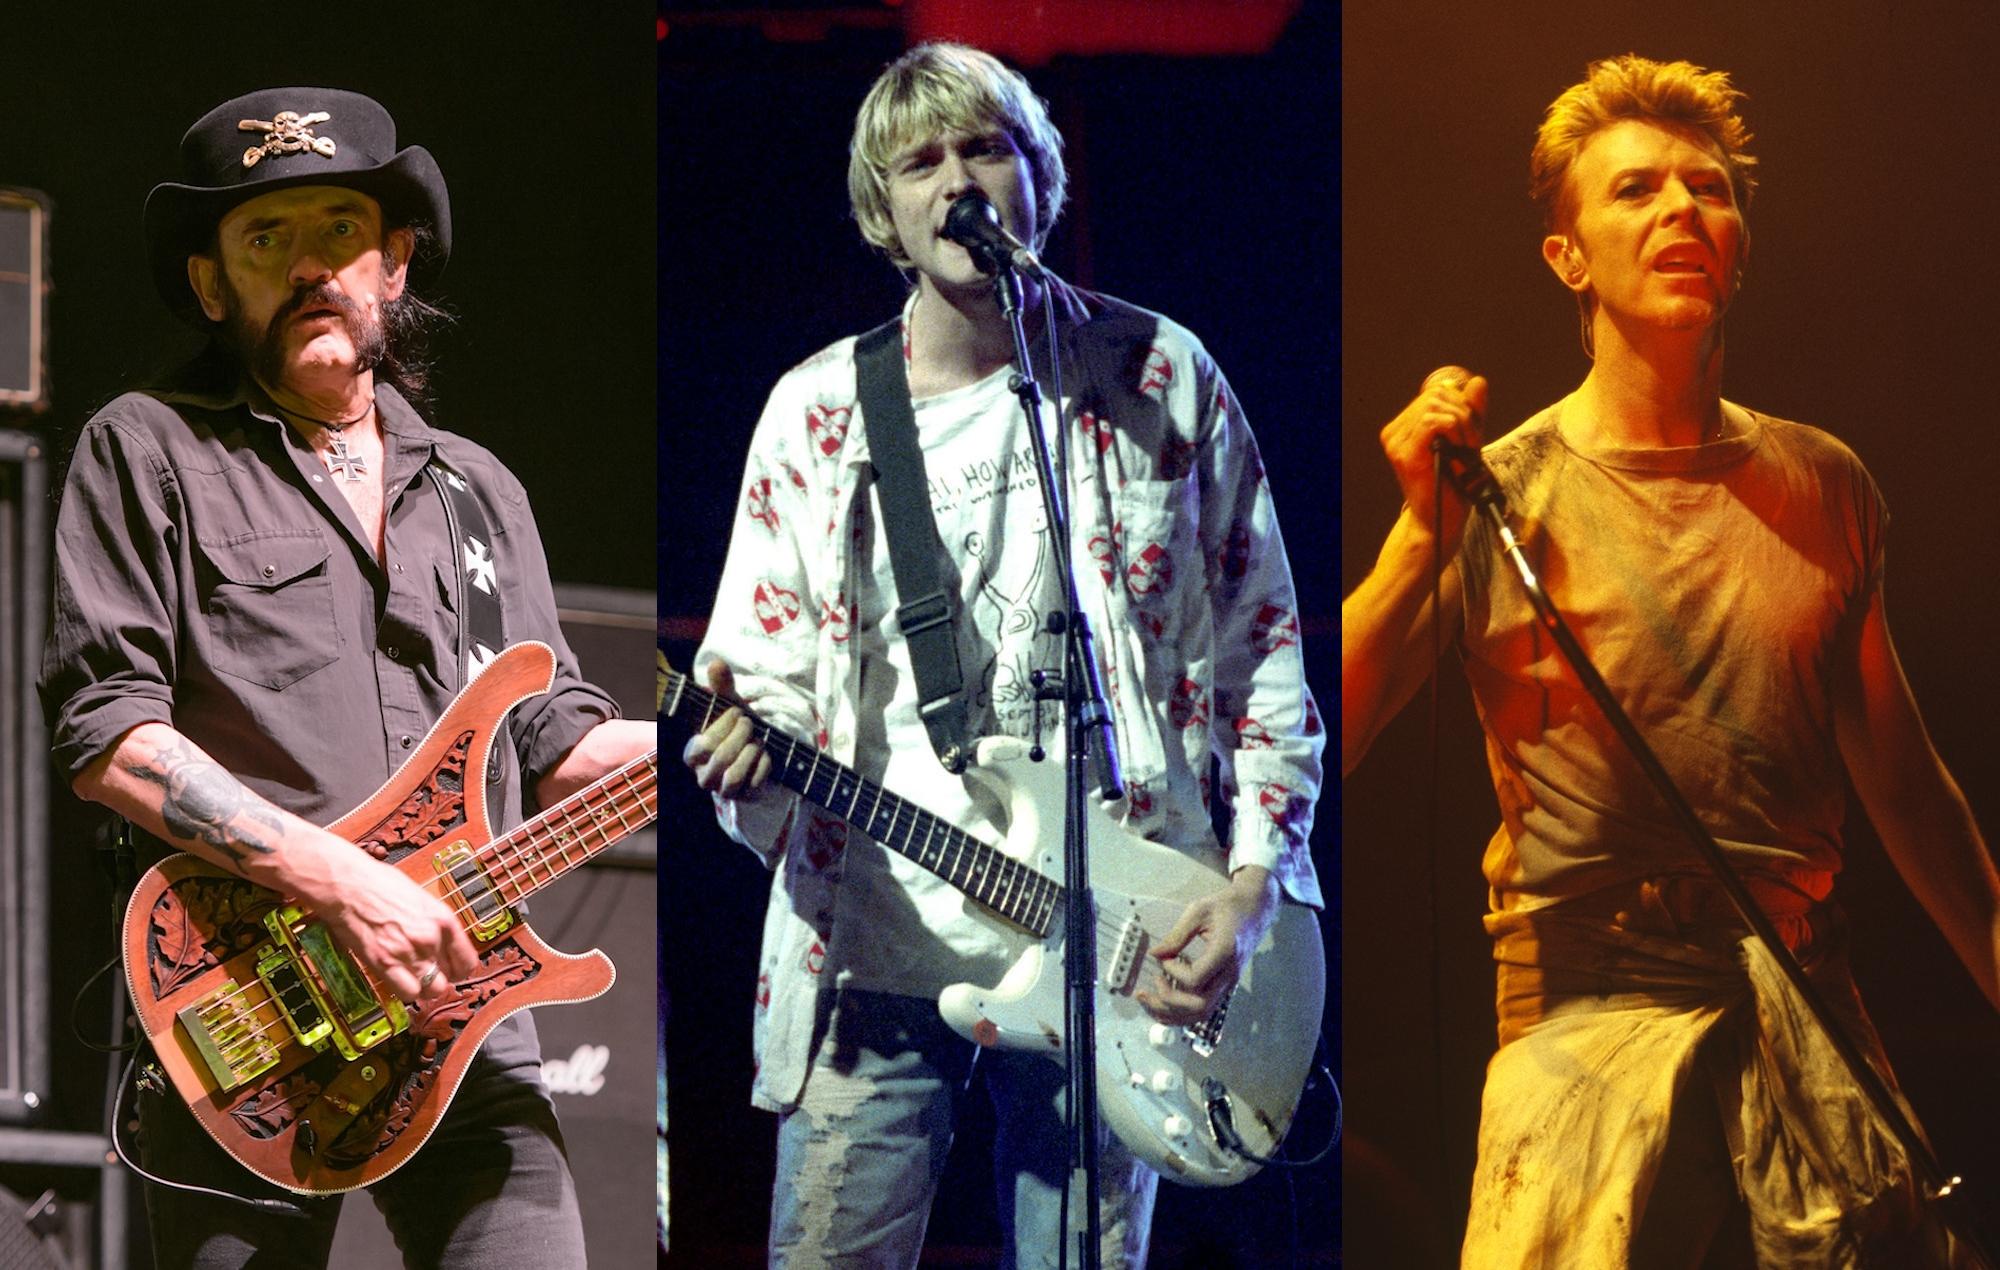 Colouring Book - Lemmy Kurt Cobain David Bowie